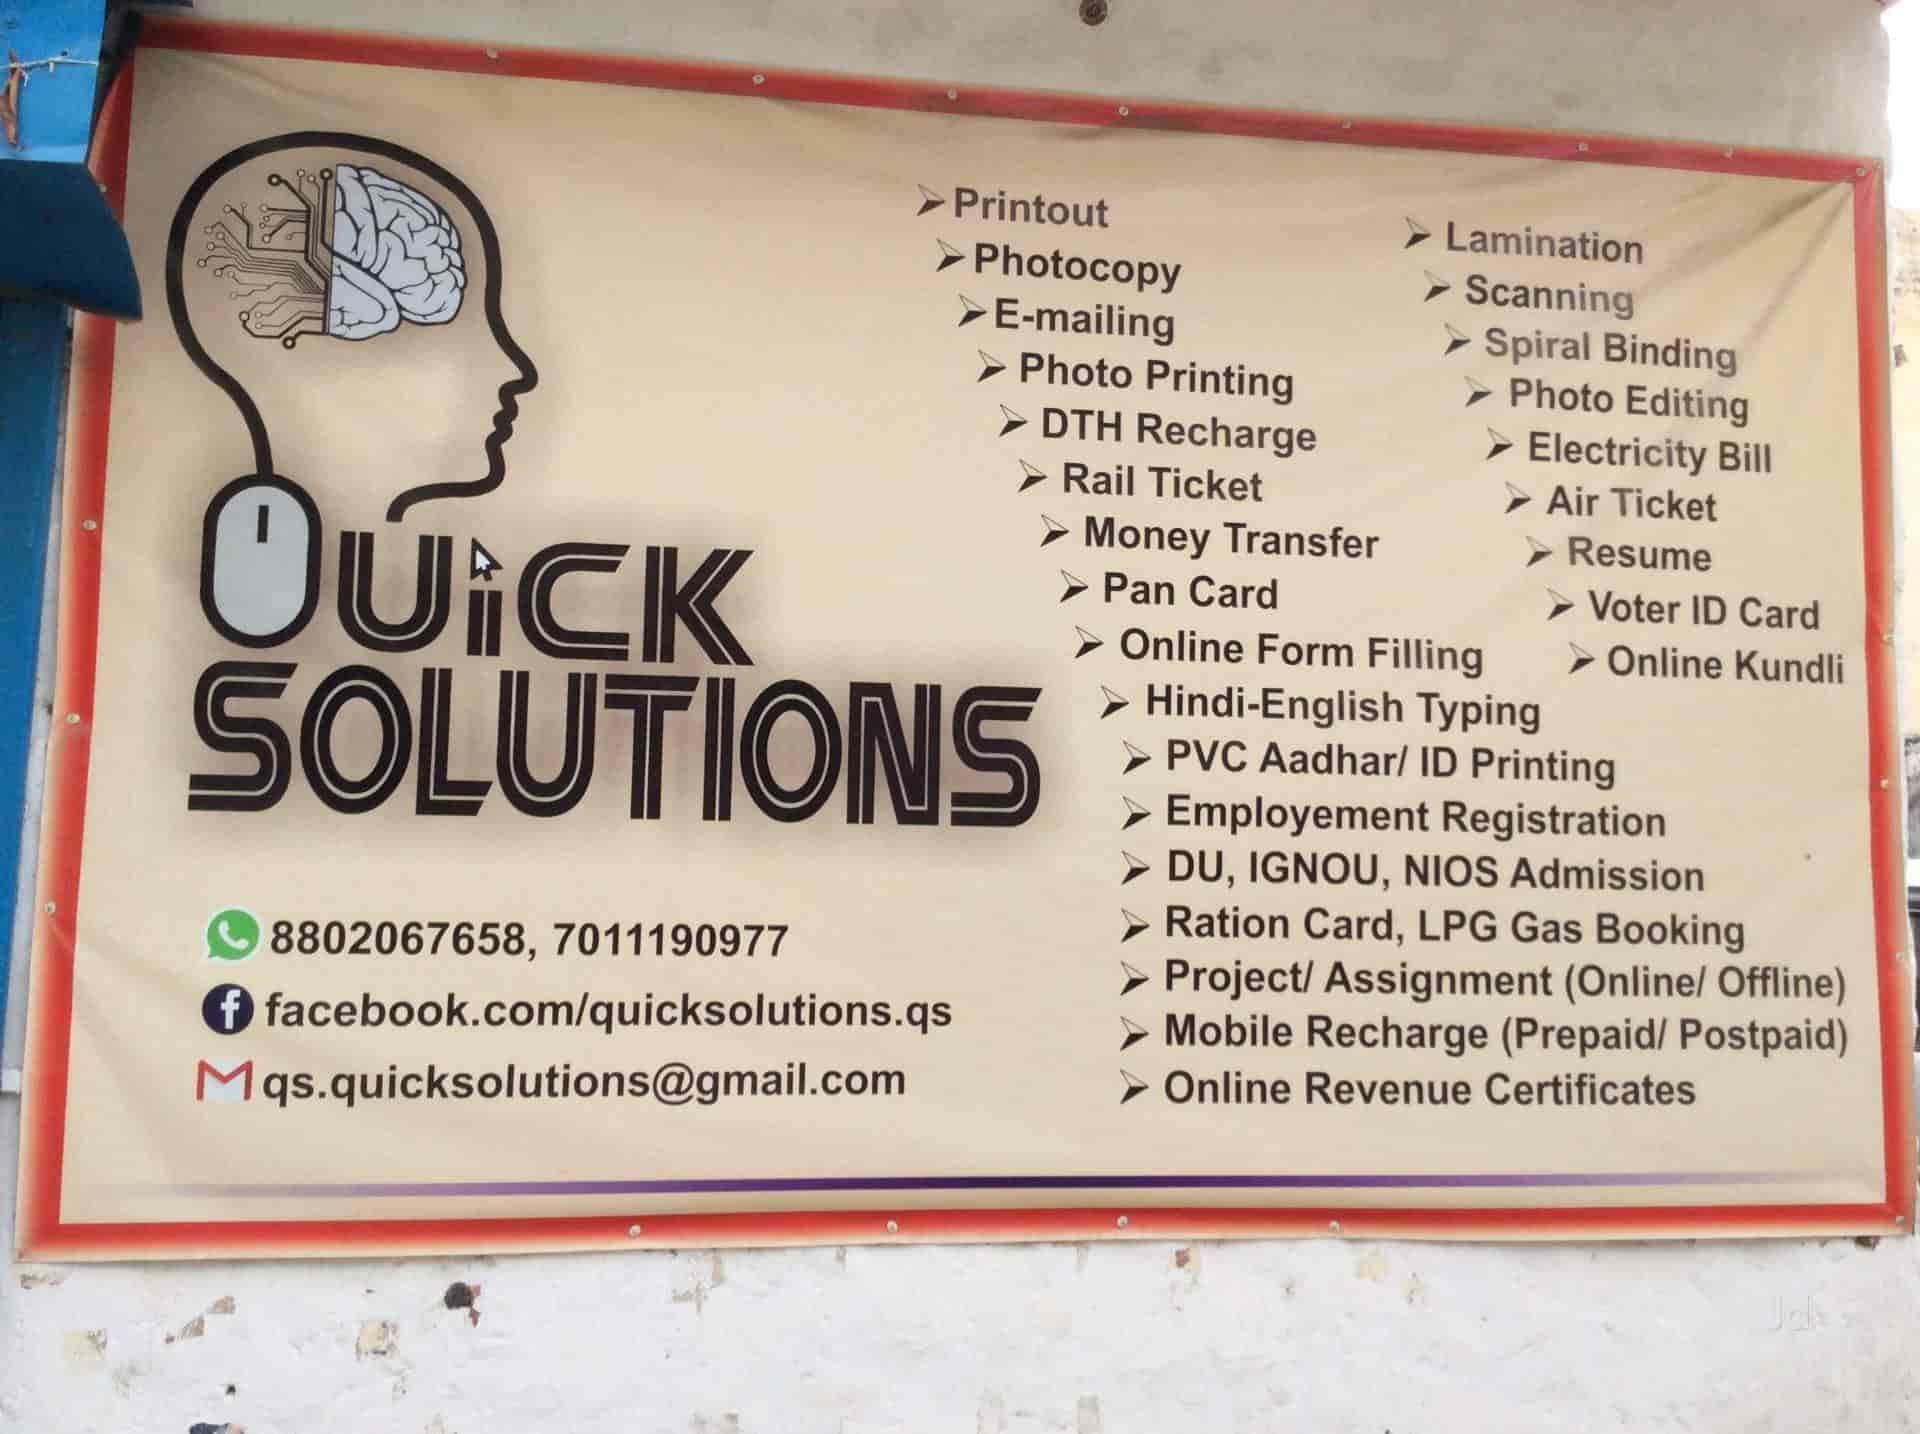 Quick Solutions Photos, Najafgarh, Delhi- Pictures & Images